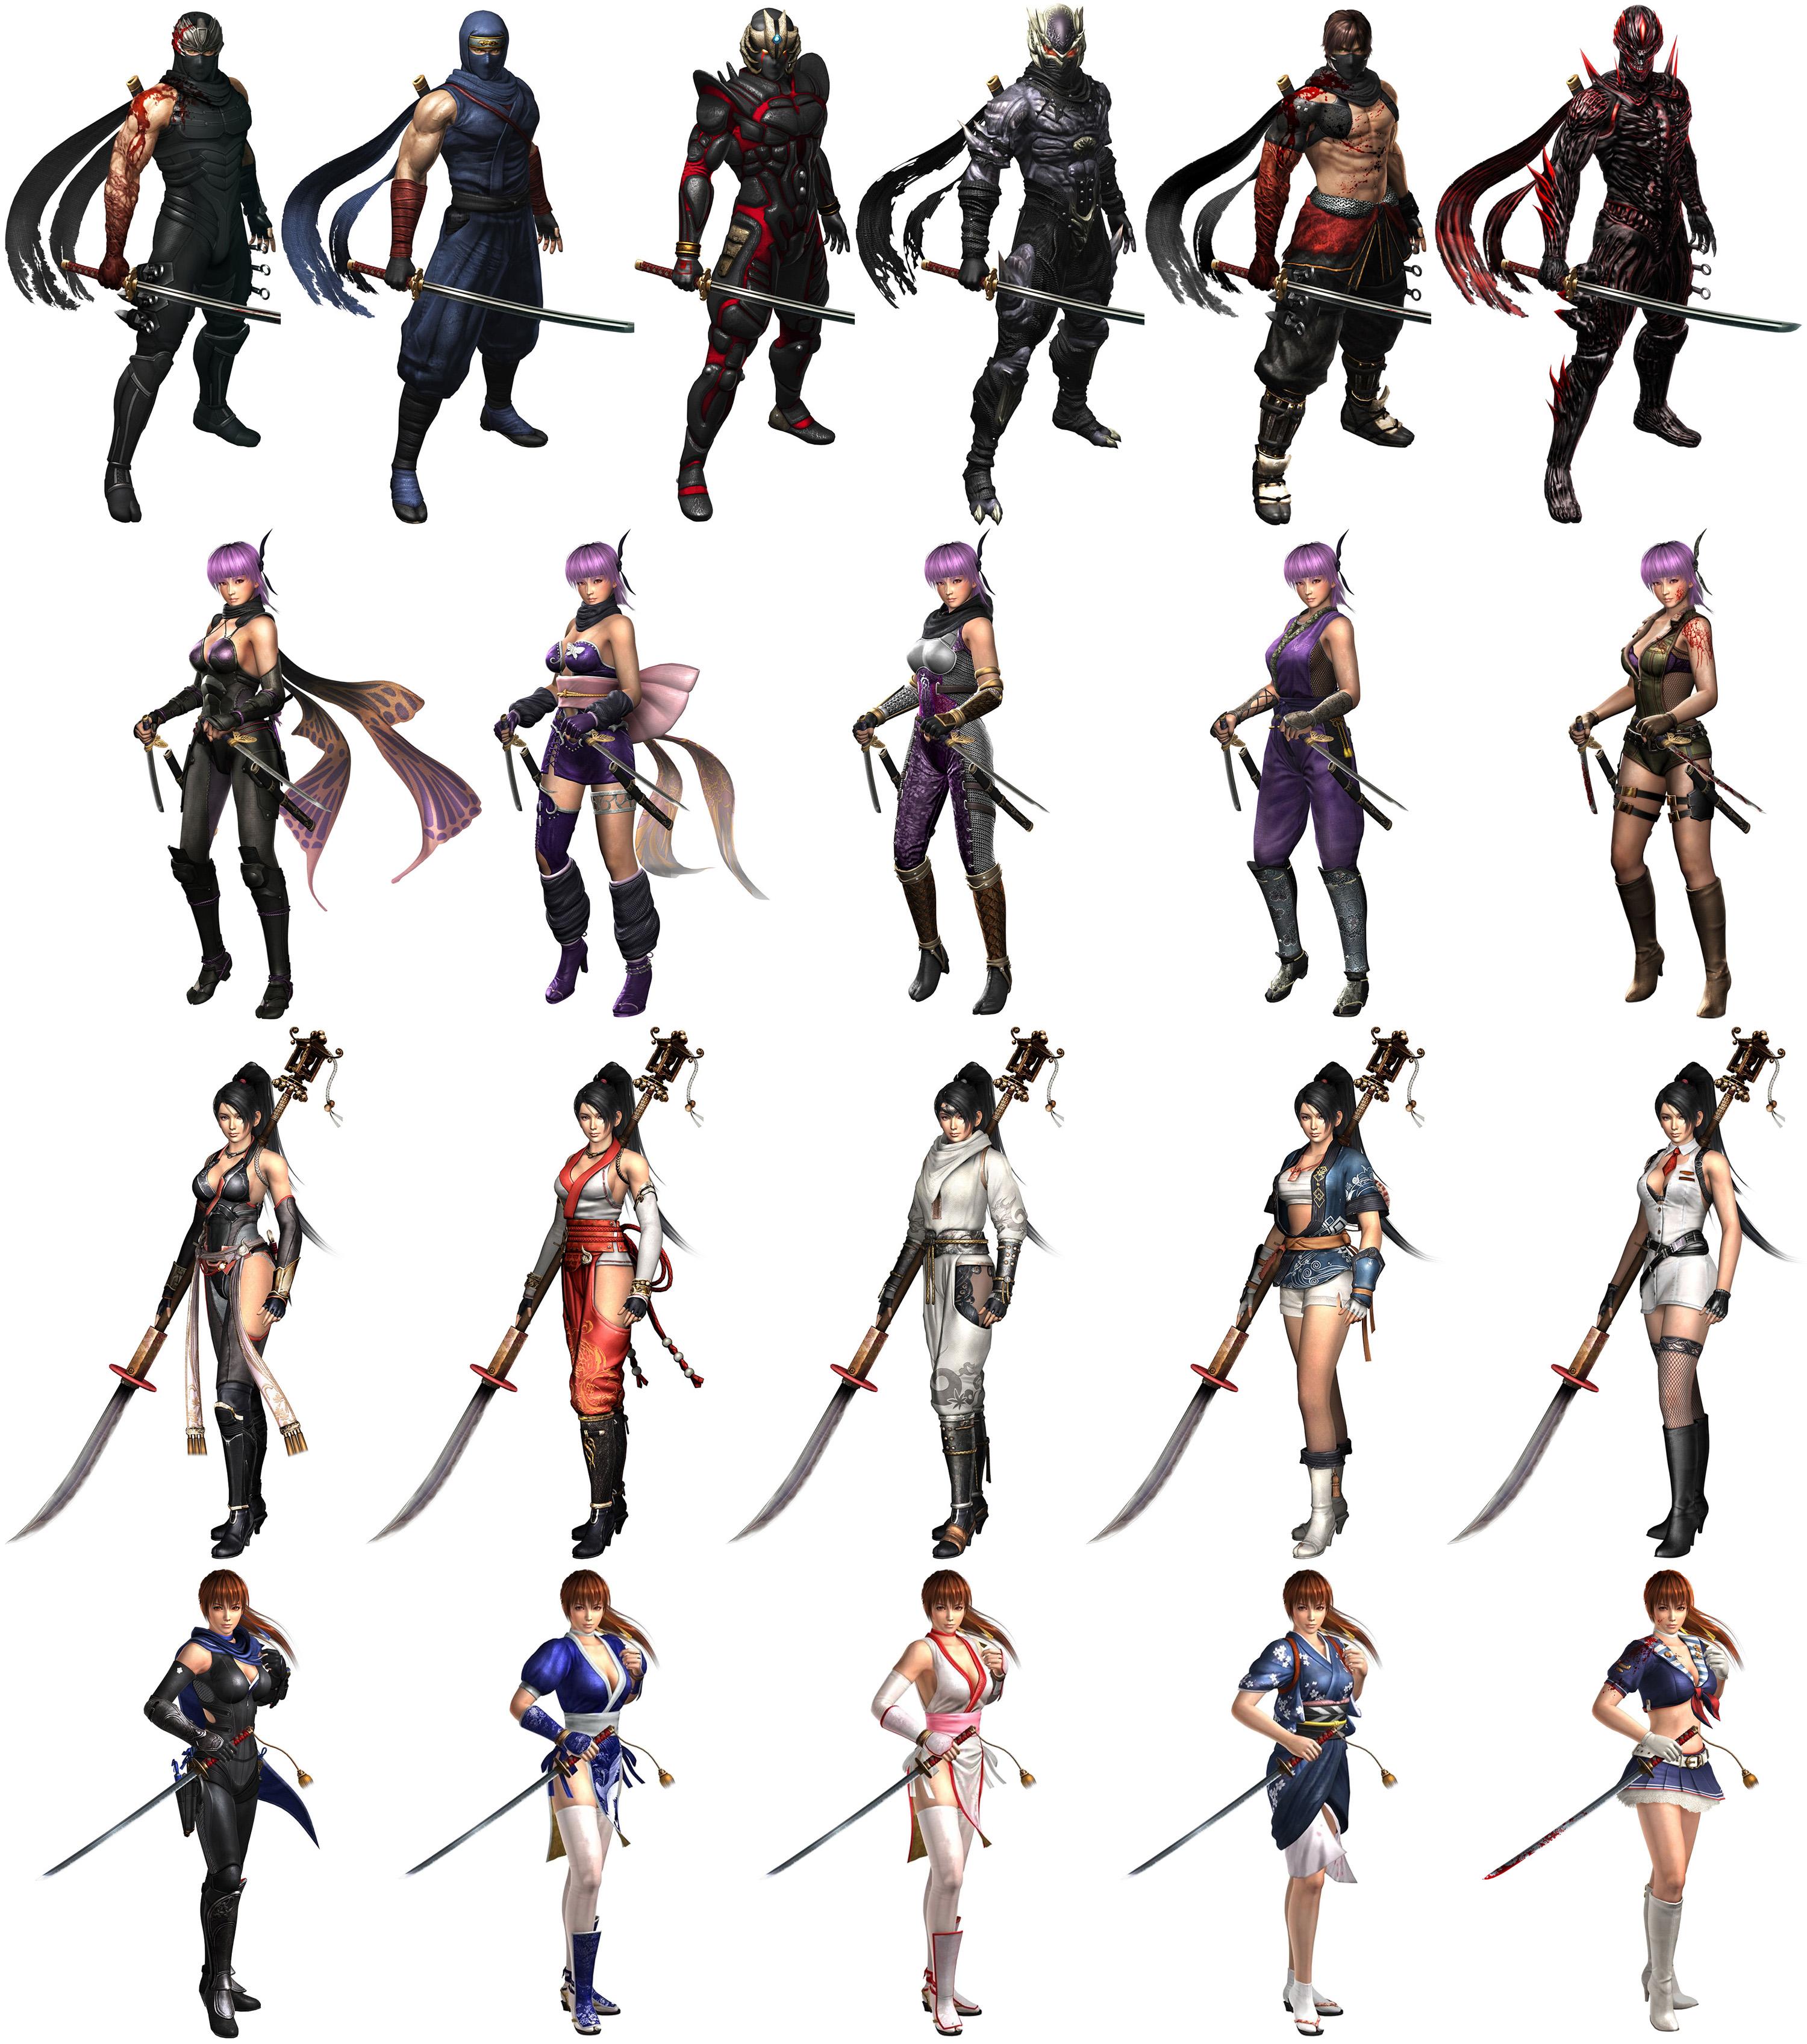 Ninja Gaiden 3: Ninja Gaiden Wiki- The Home Of All Things Ninja